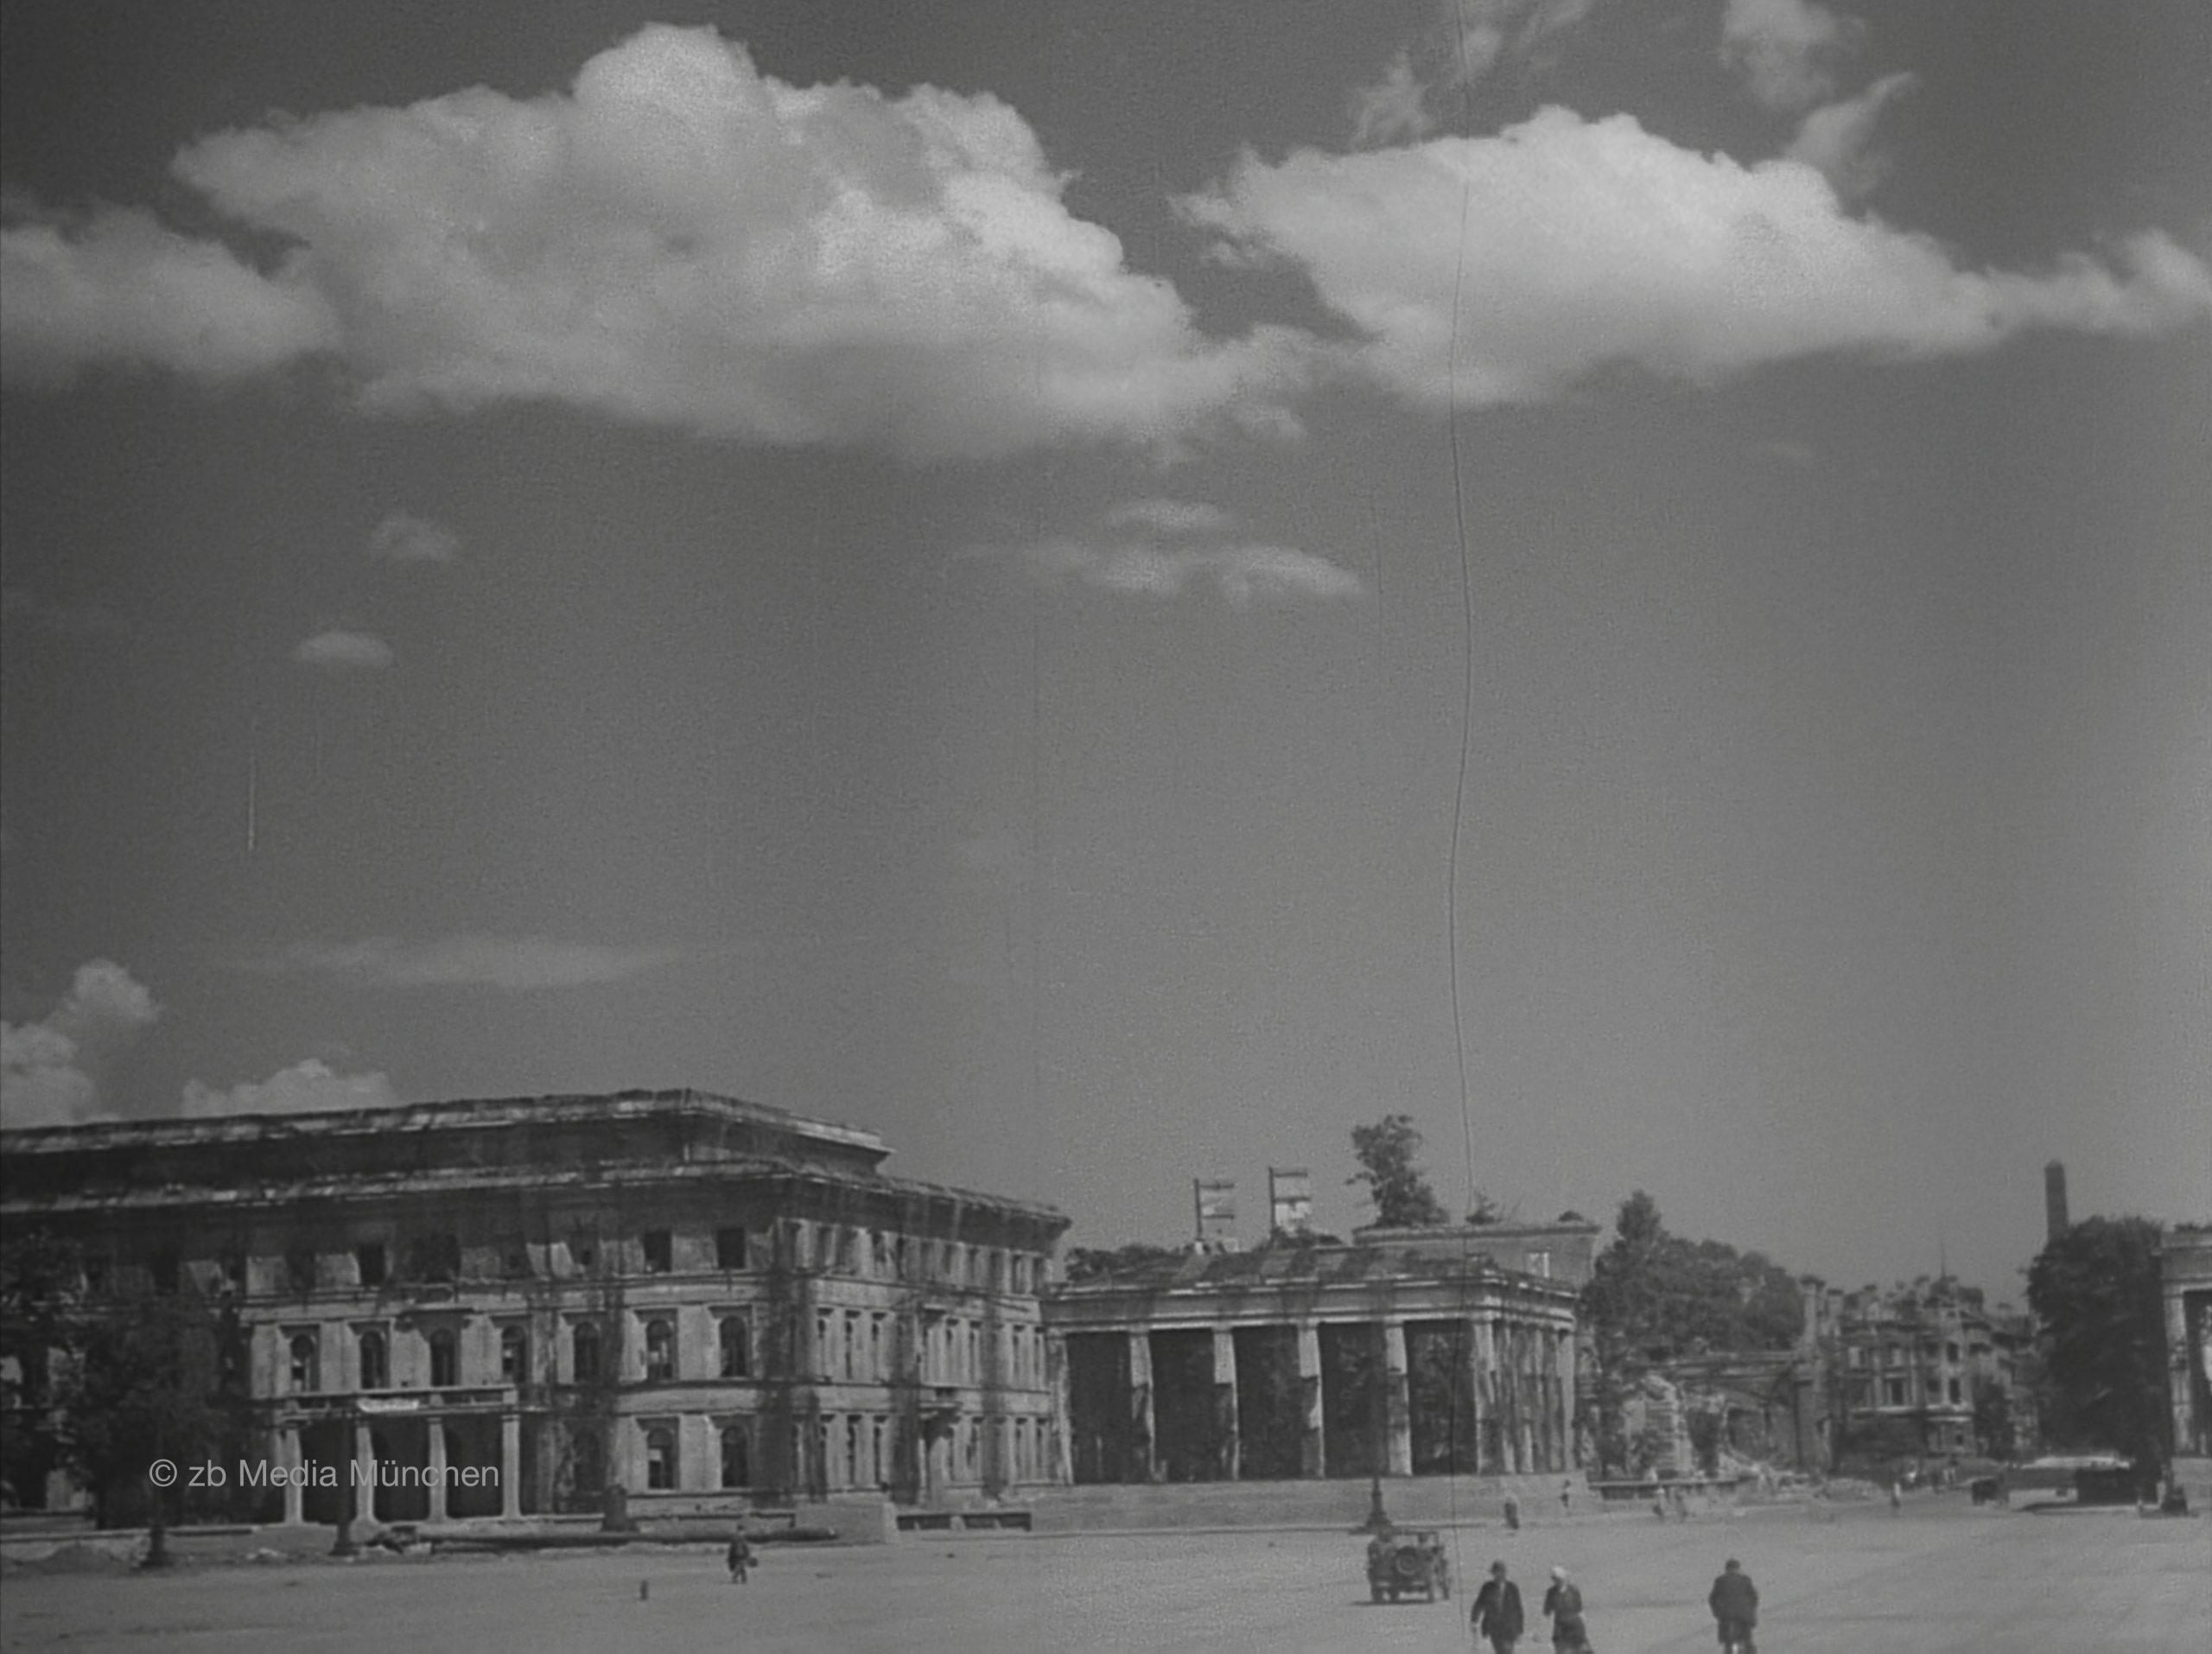 Arcisstrasse, Führerbau, München 5. Mai 1945